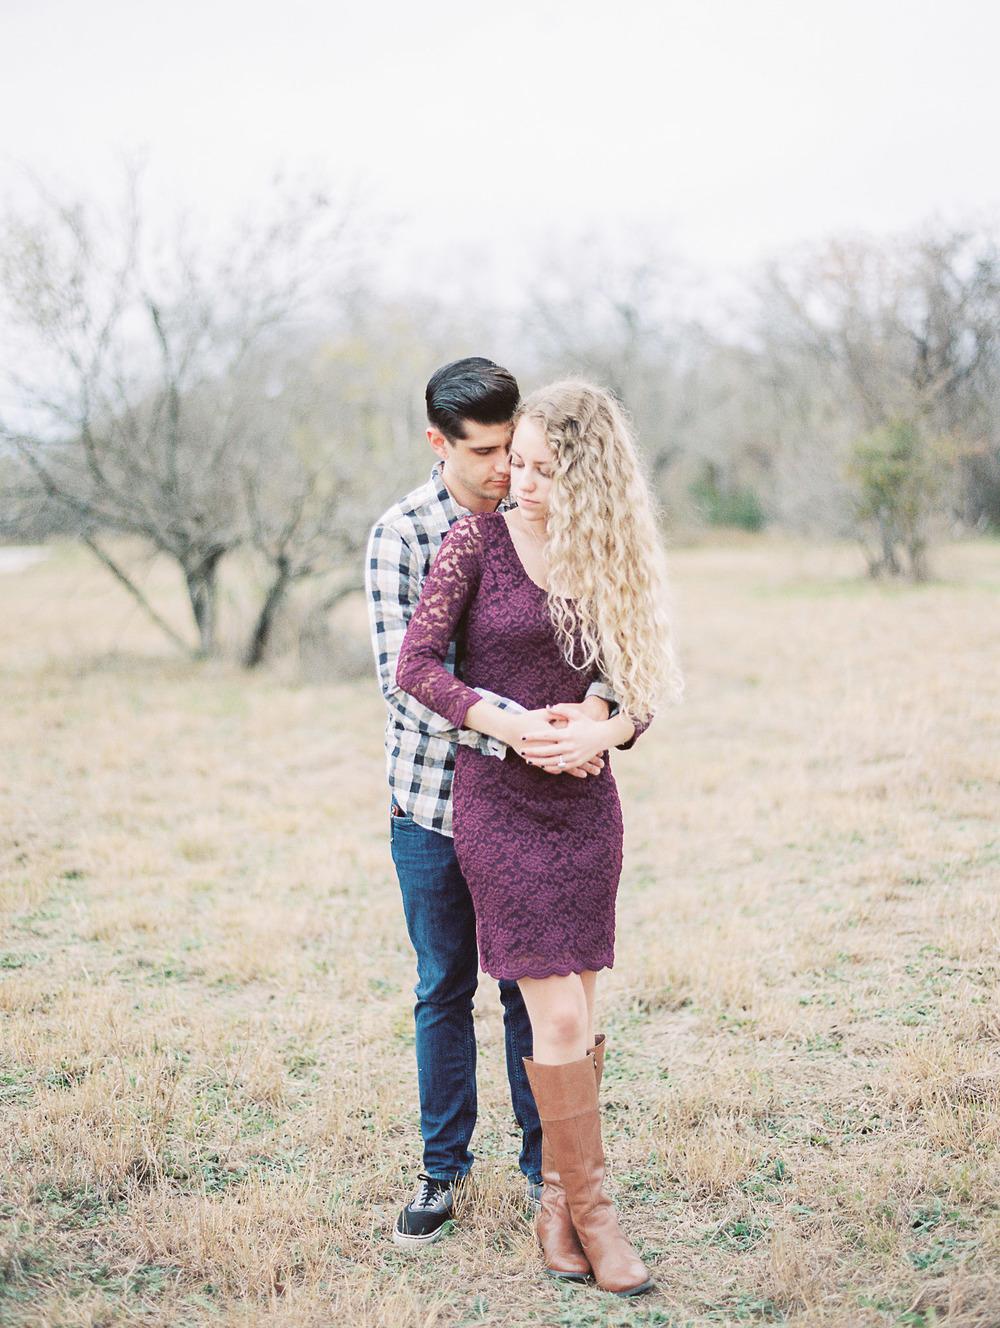 alyssa-nikole-photography-engagement-Austin-Mckinny-falls-7.jpg